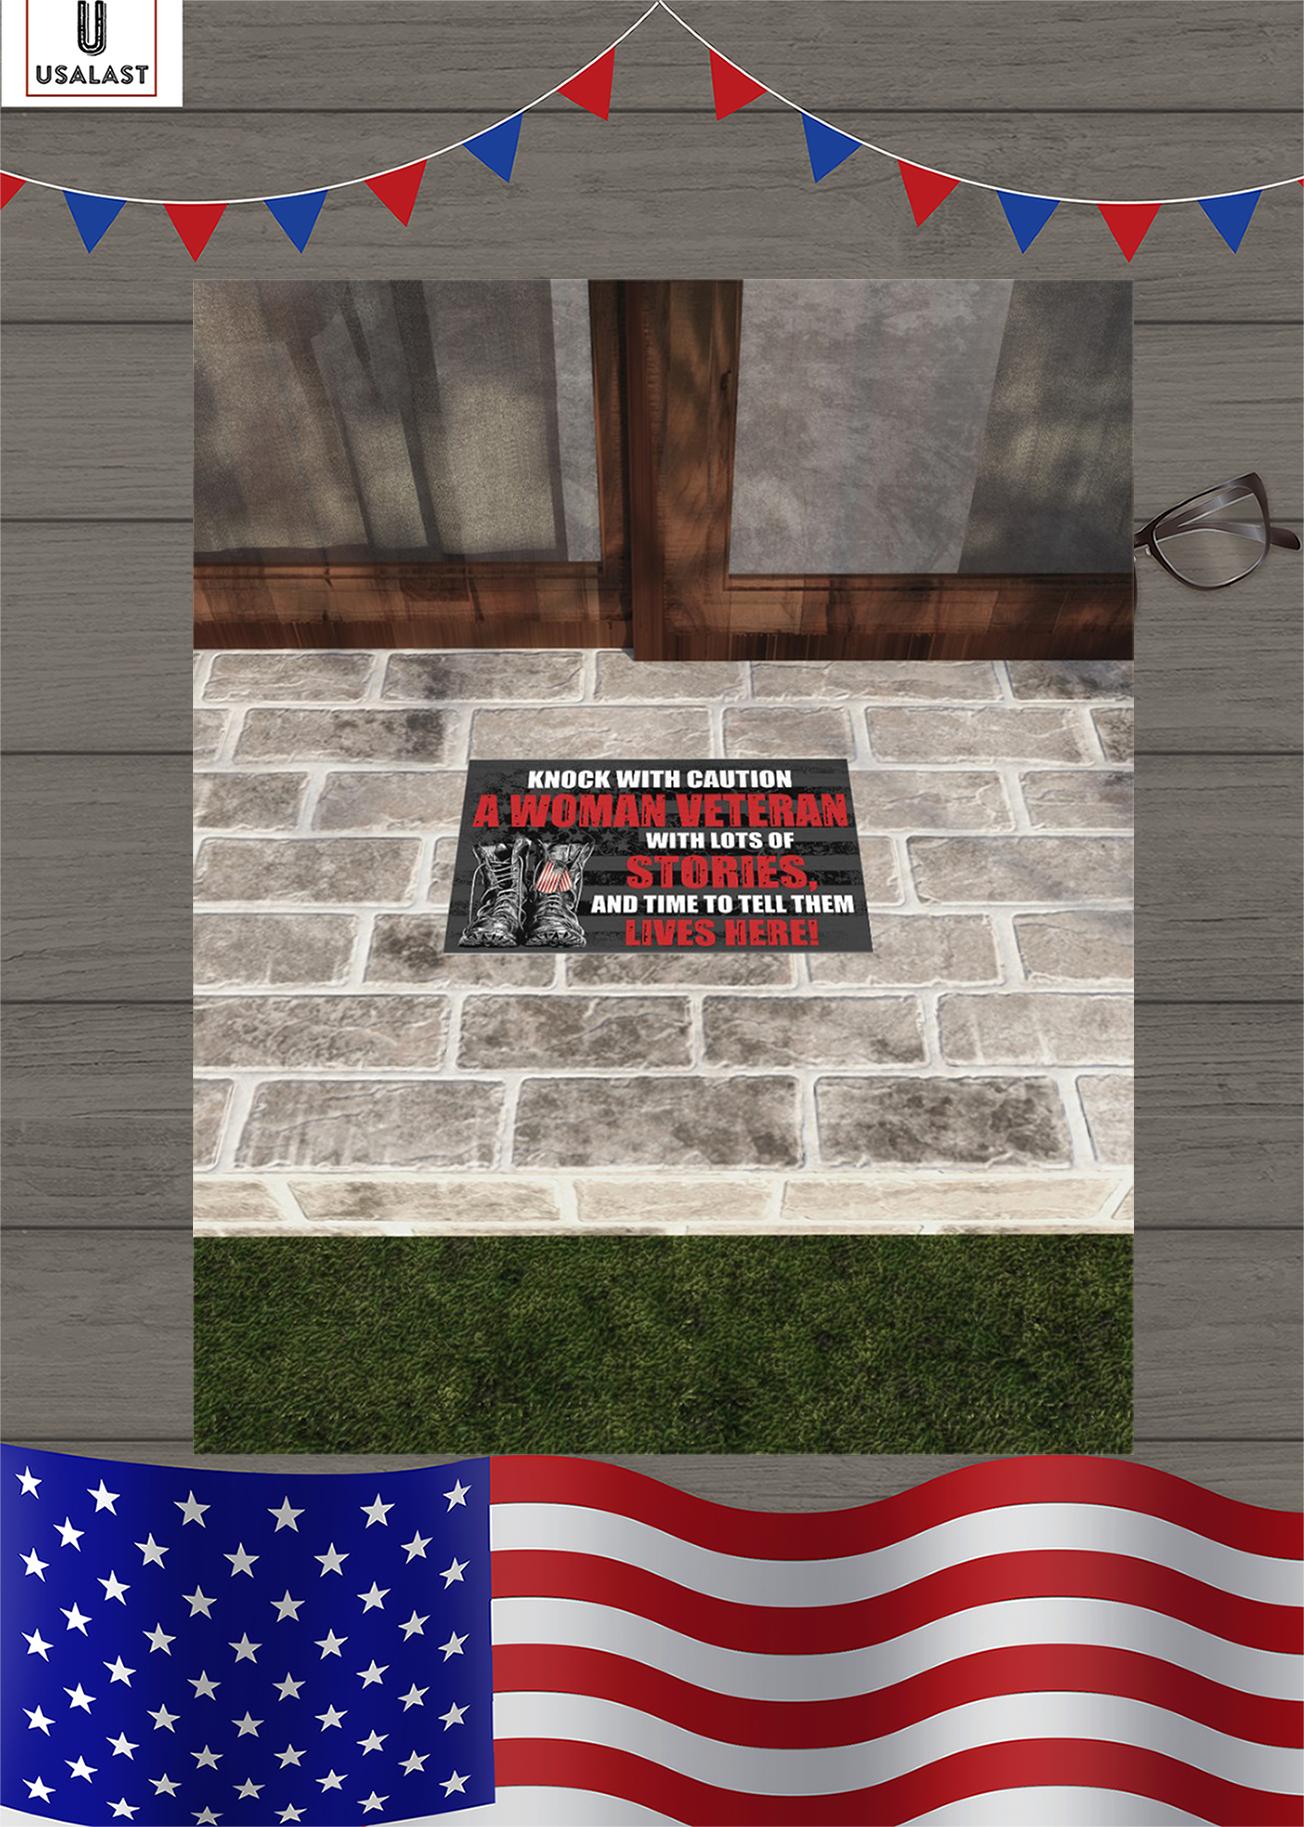 Knock with caution a woman veteran doormat